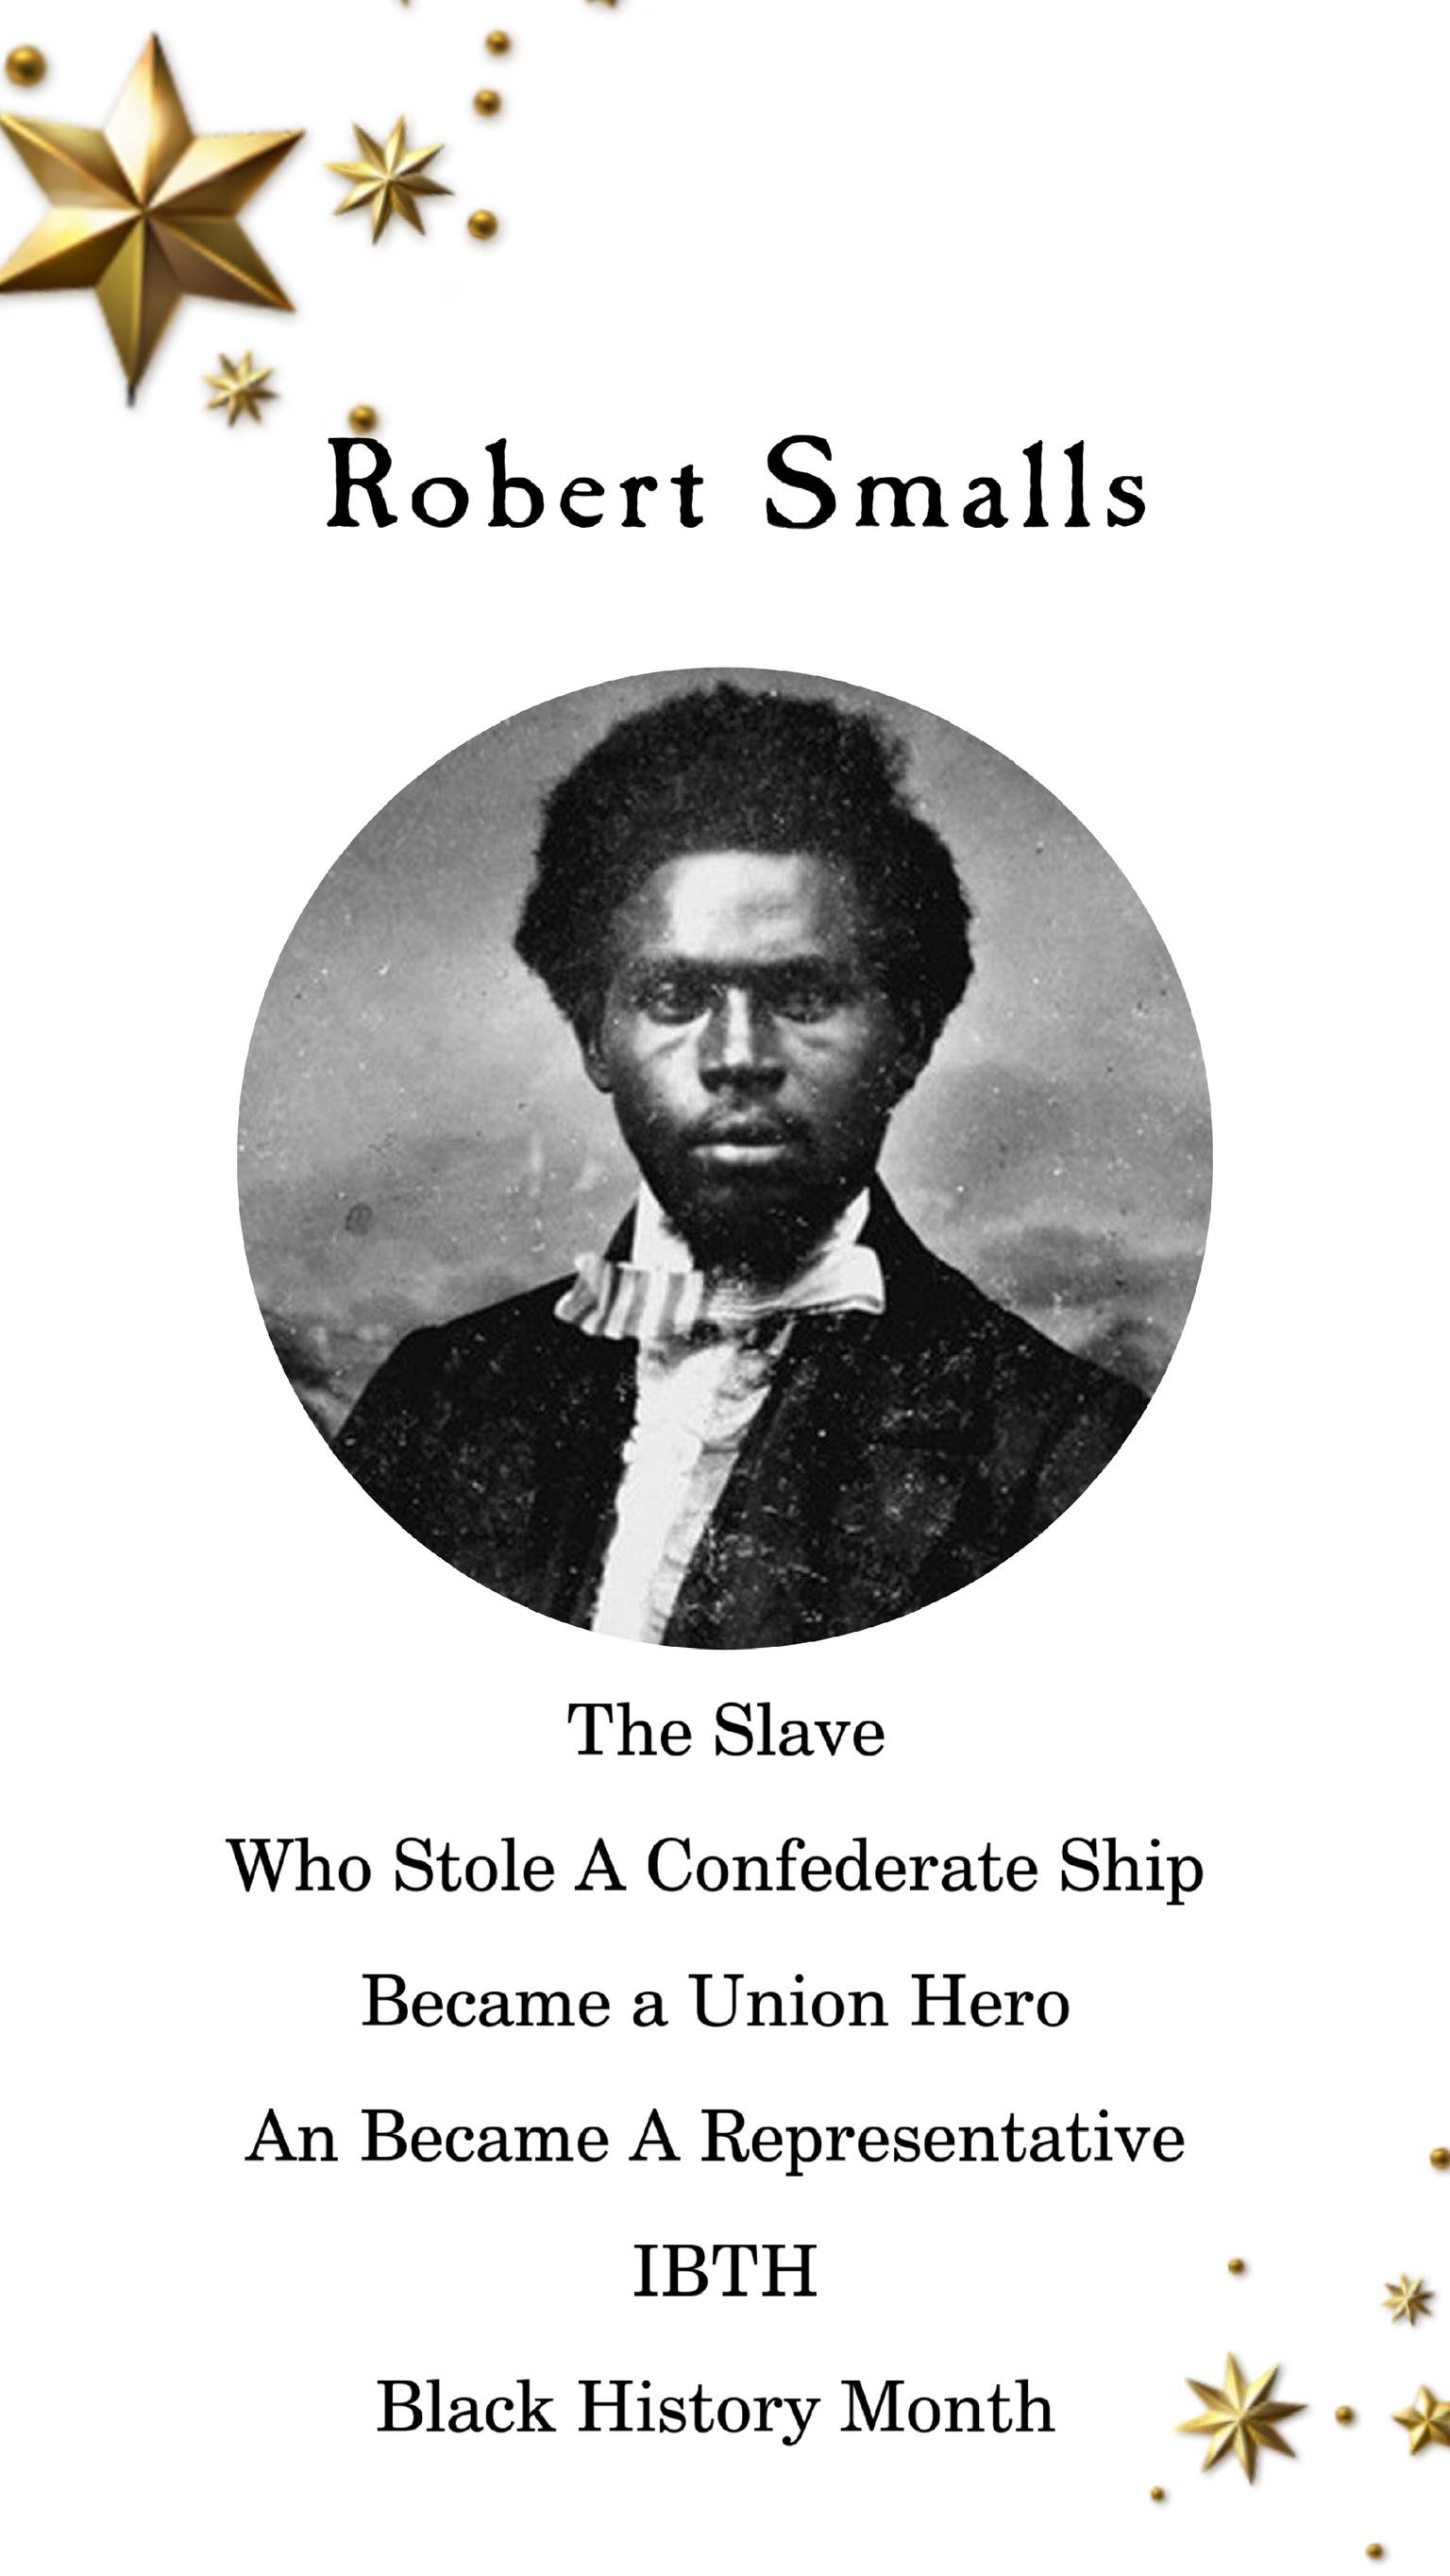 Robert Smalls: Black History Month